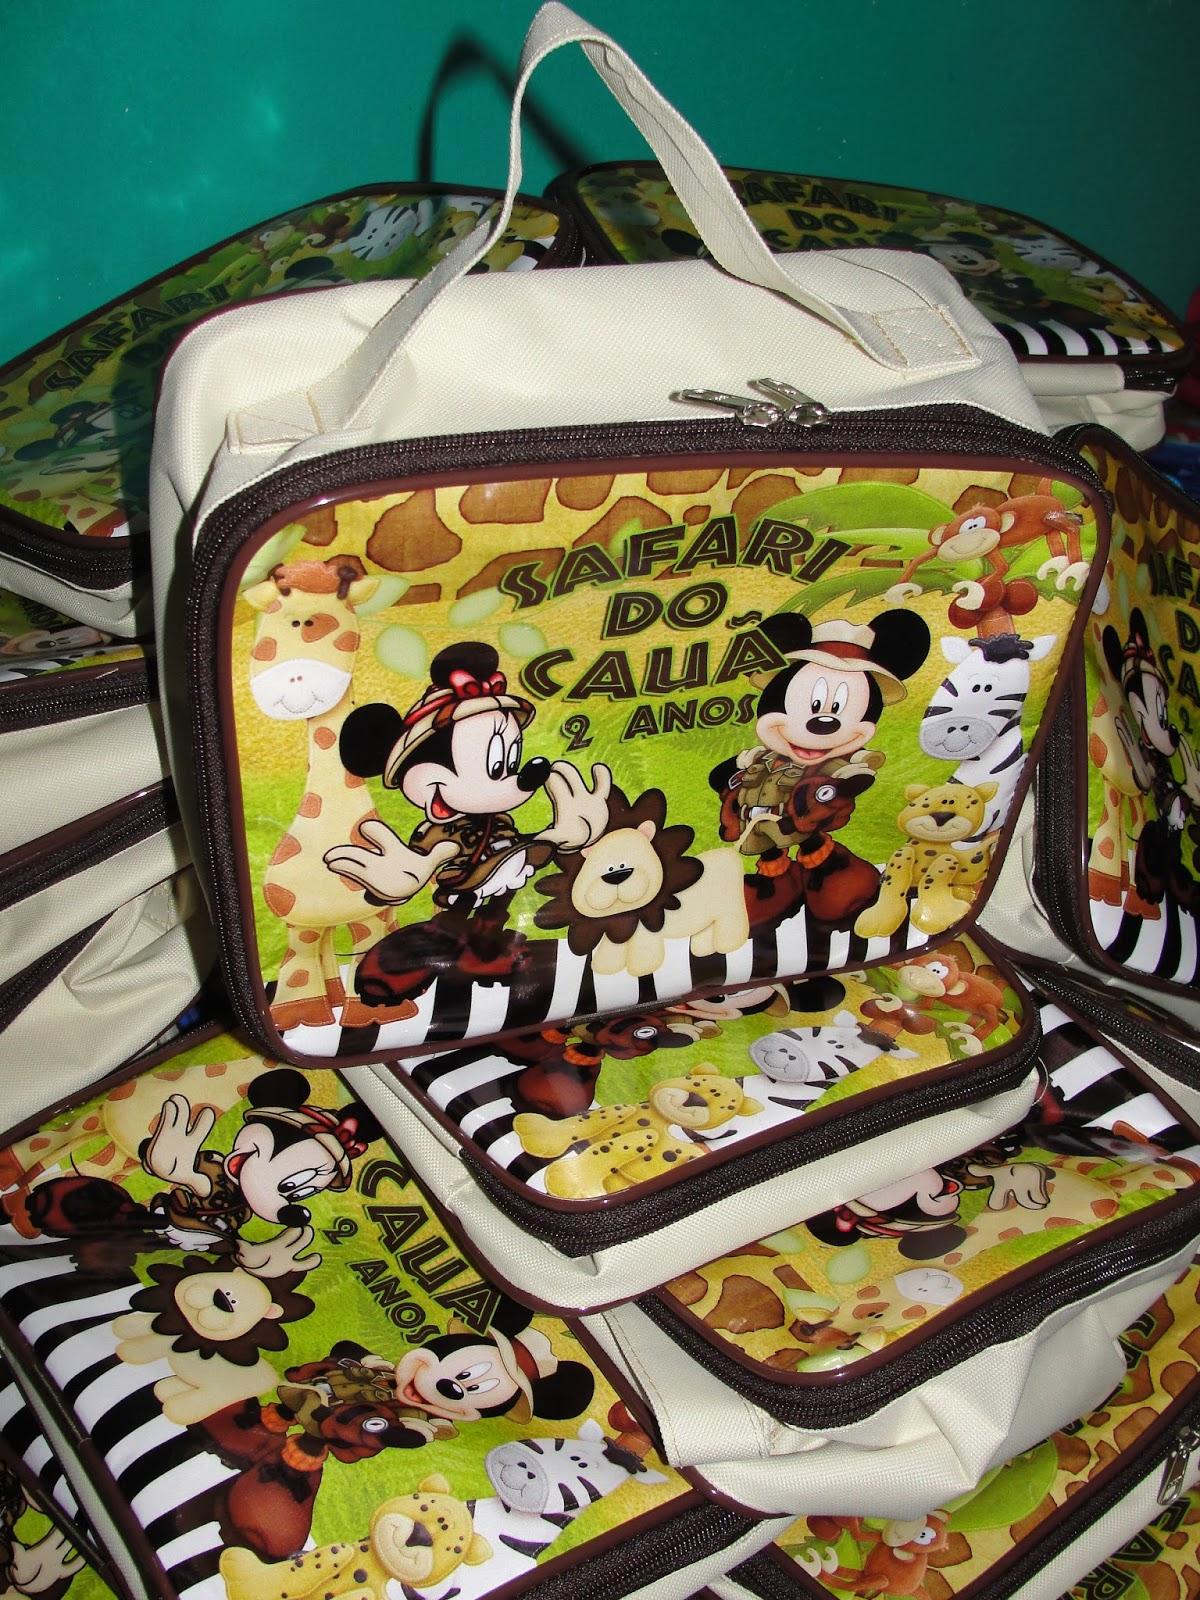 Bolsa De Festa Saara : Belissima bolsas mochila lembracinha safari bolsa